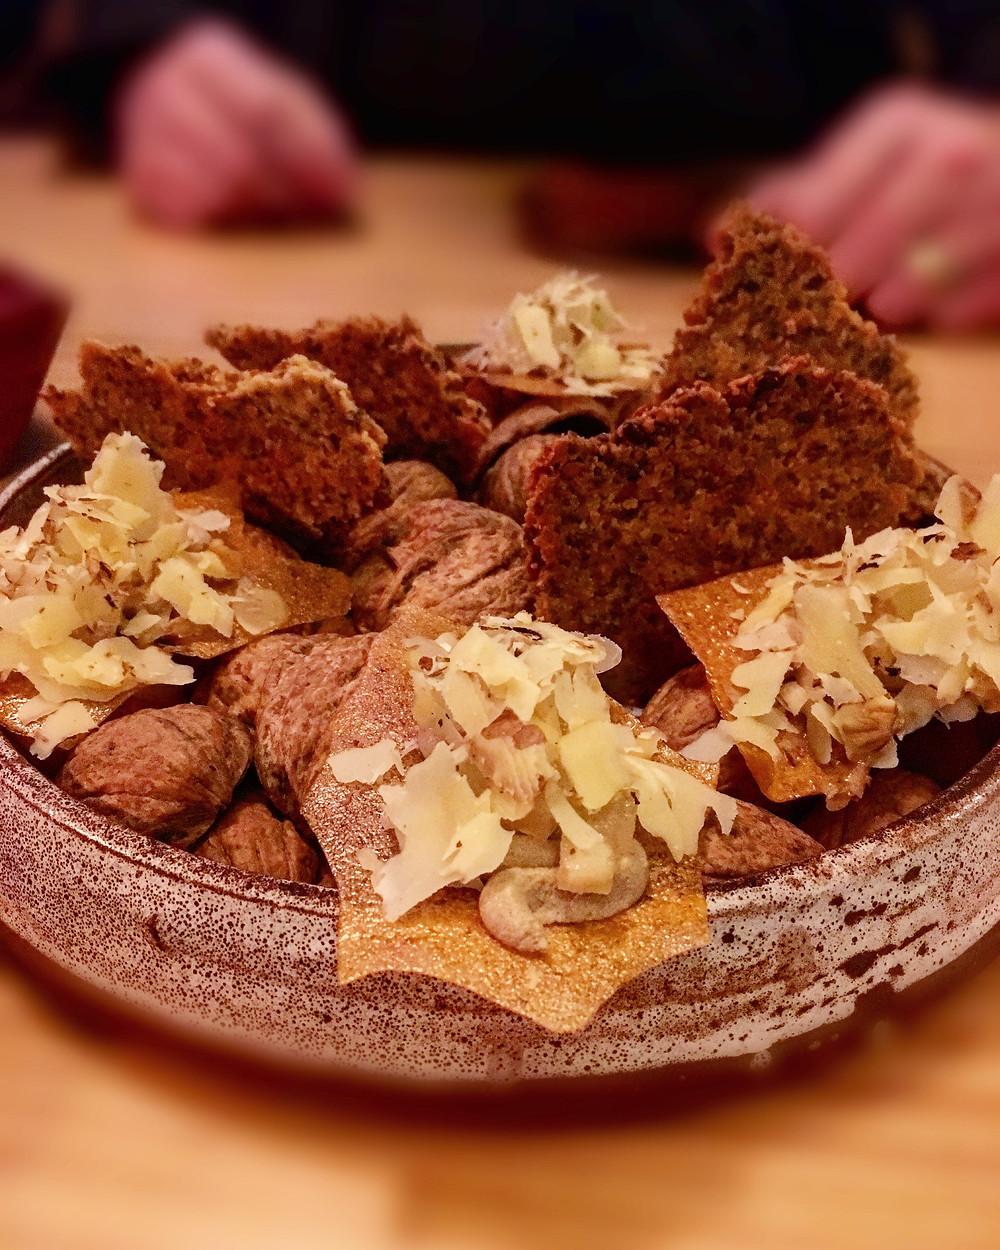 Amaru | Artichoke, crackers & walnuts